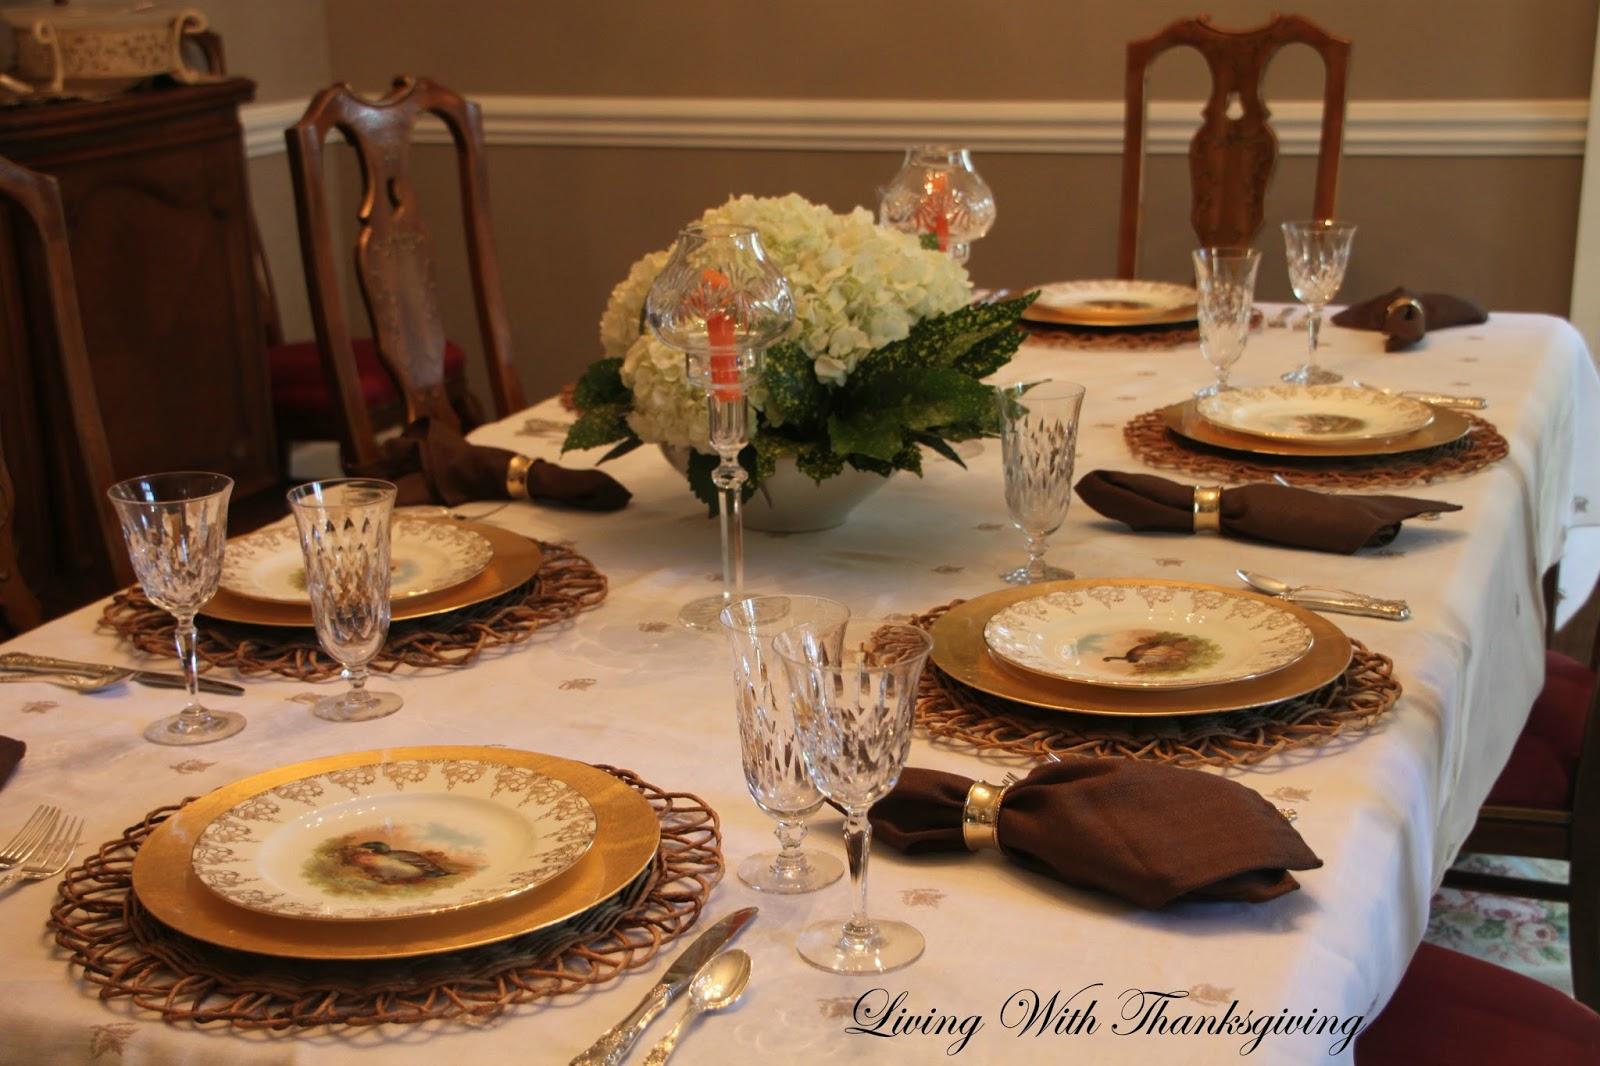 Family Thanksgiving Dinner - Living With Thanksgiving